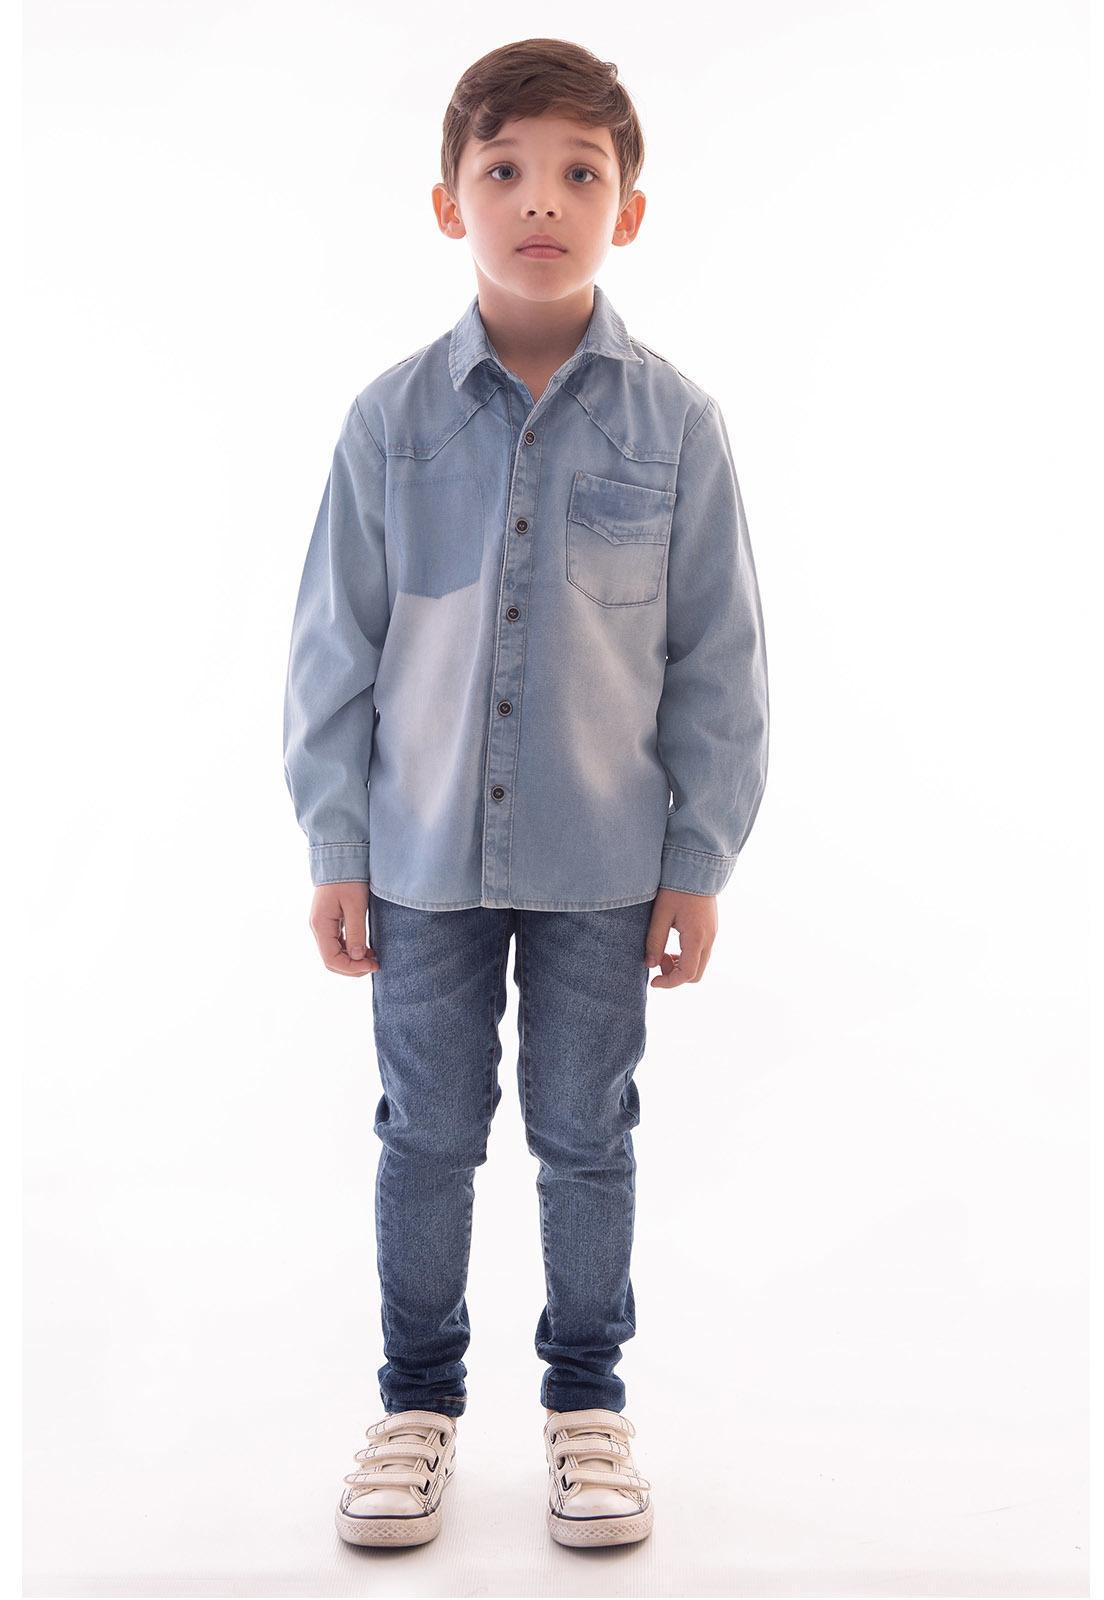 Camisa Jeans Manga Longa Ref. 519